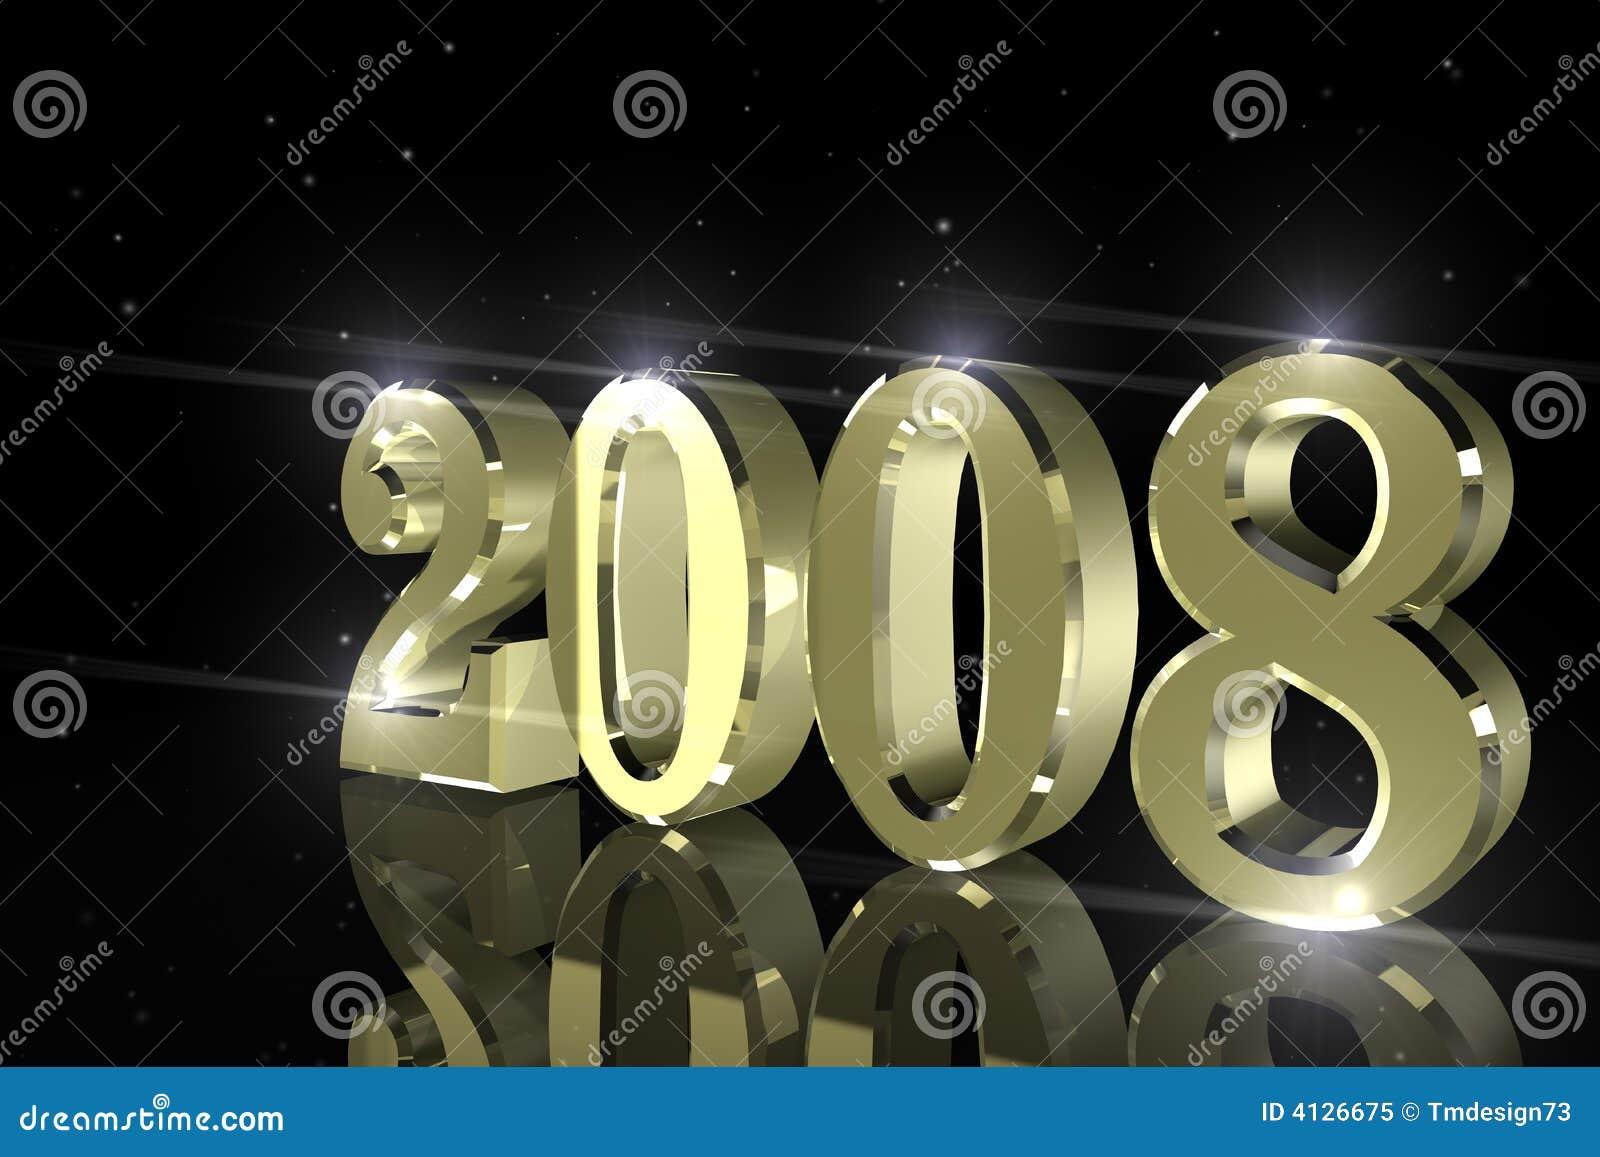 Happy New Year, 2008 Royalty Free Stock Photo - Image: 4126675